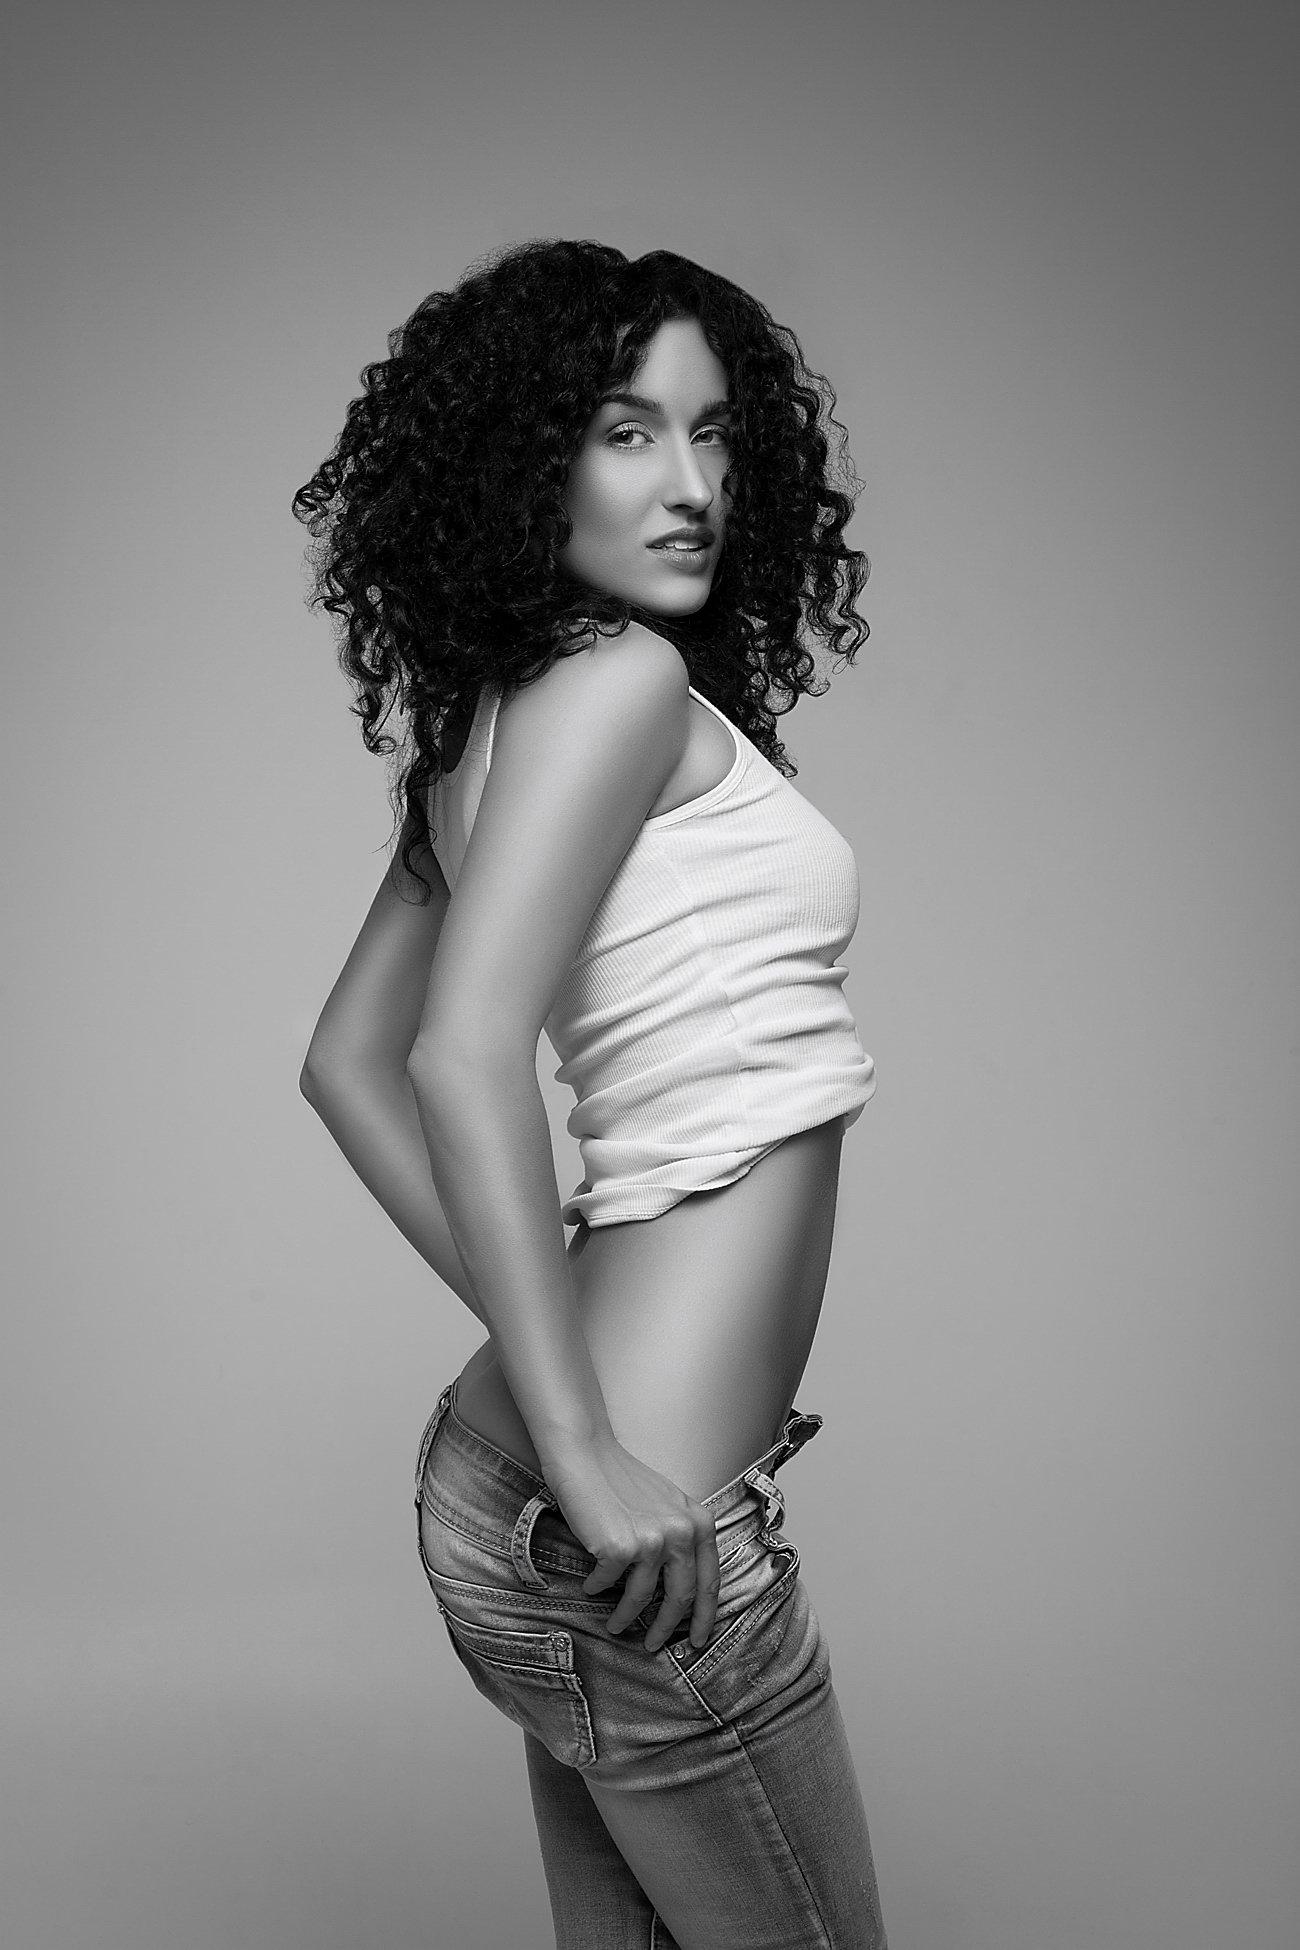 model, fine art, sexy, sensual, black and white, woman, female, body, erotica, glamour, curves, portrait, beautiful, fashion,, Lajos Csáki